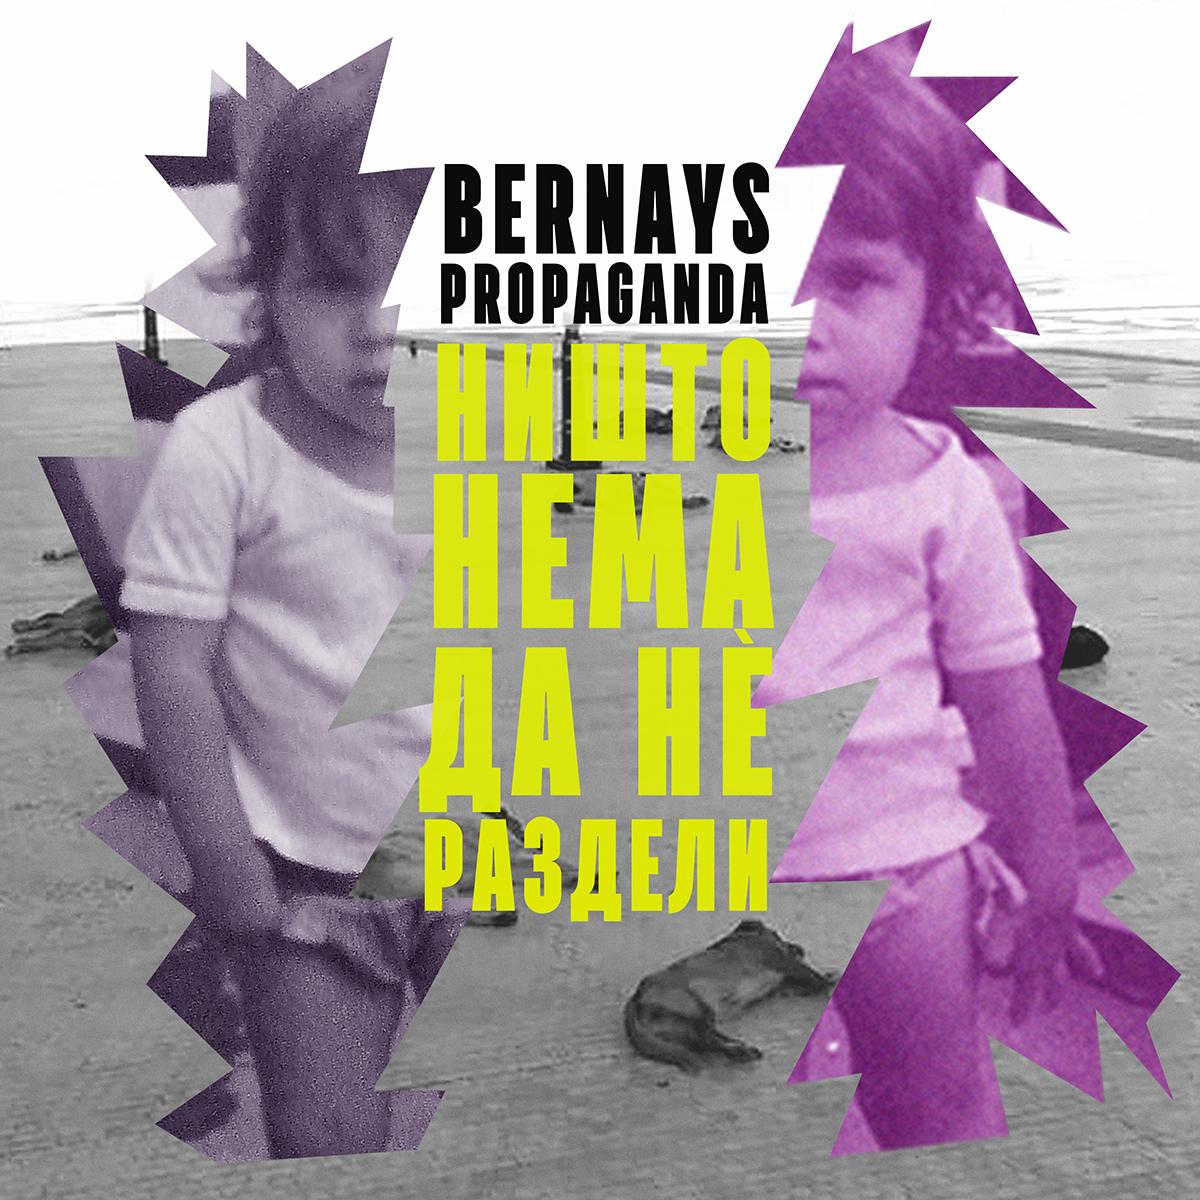 BERNAYS PROPAGANDA - Ništo nema da nè razdeli